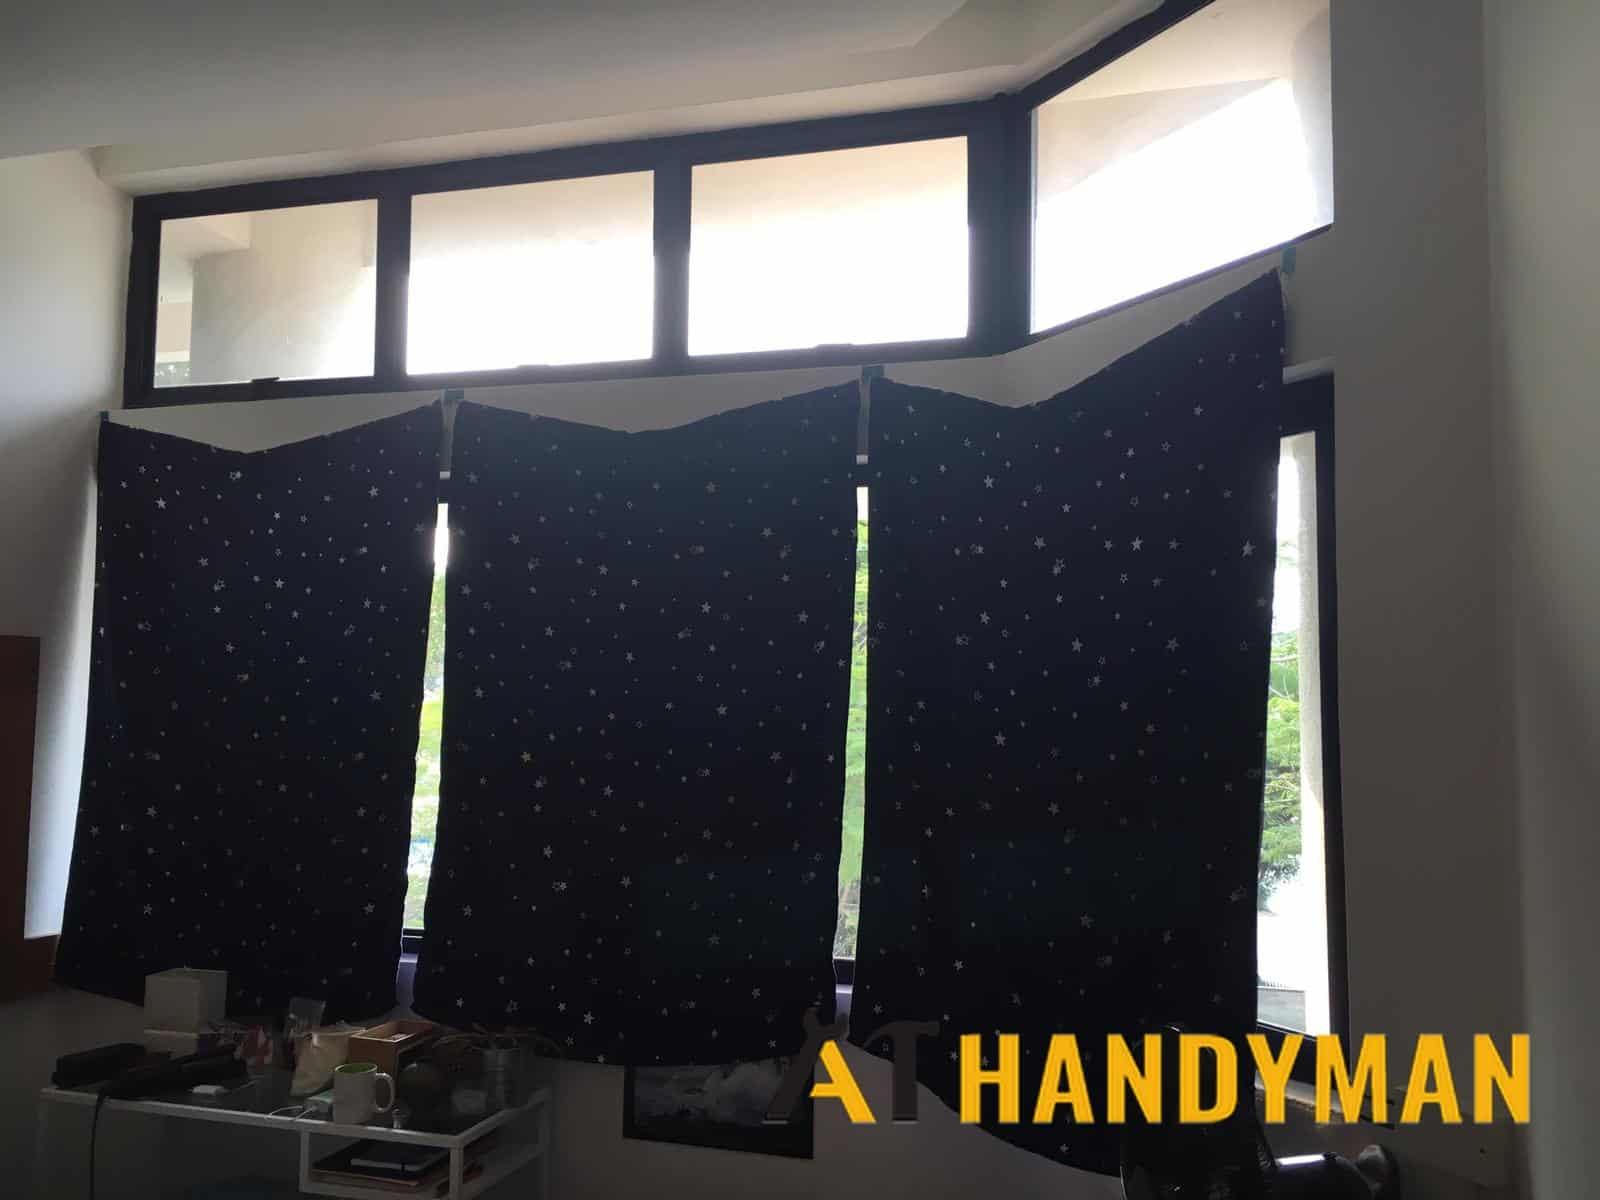 install-curtain-rod-drilling-services-a1-handyman-singapore-condo-lorong-sarhad-2